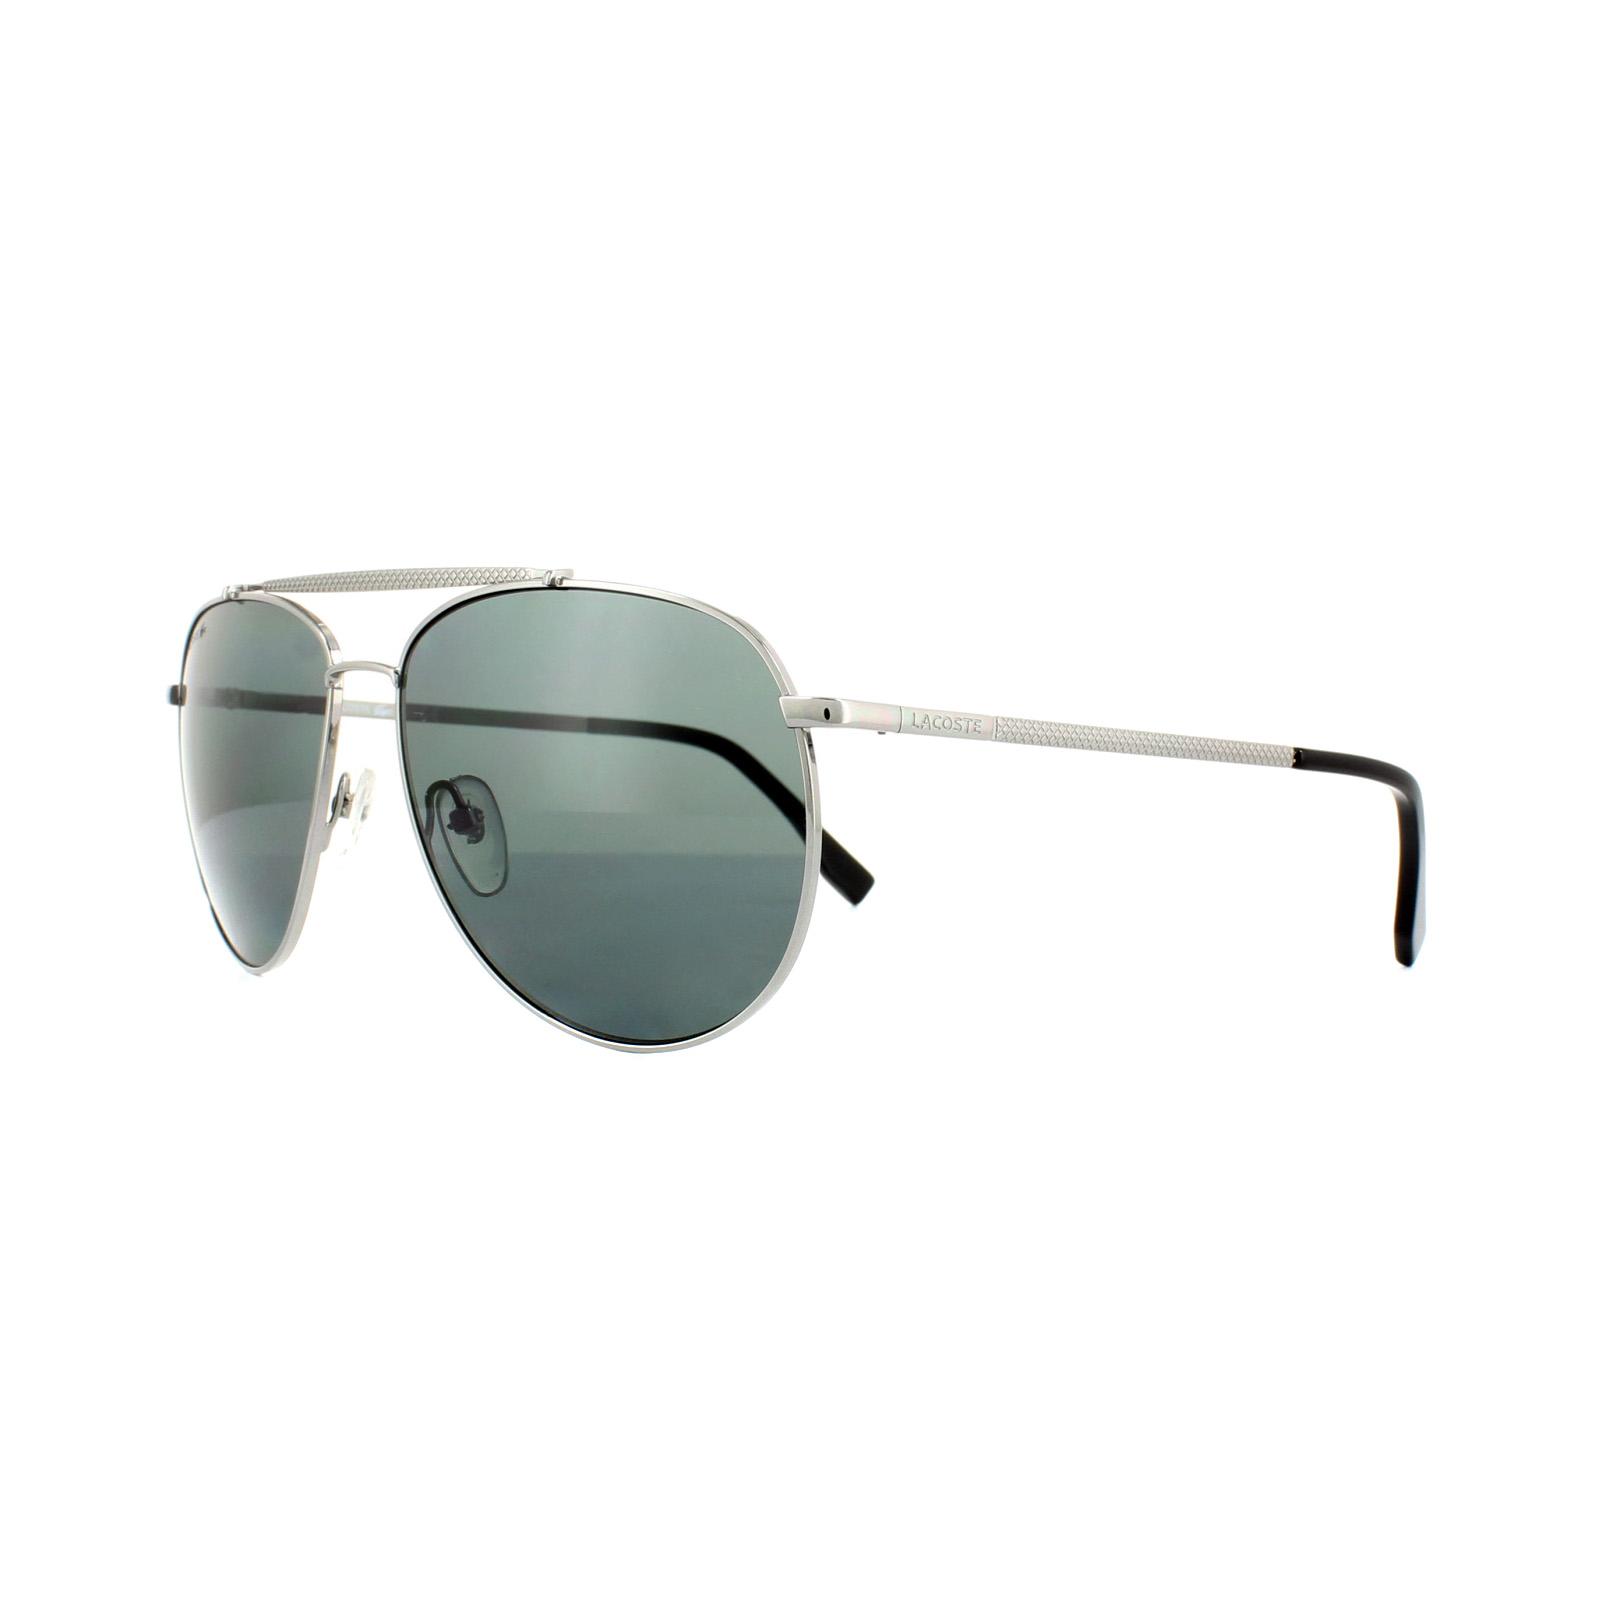 aebfd16e862 Sentinel Lacoste Sunglasses L177SP 033 Gunmetal Grey Dark Grey Polarized